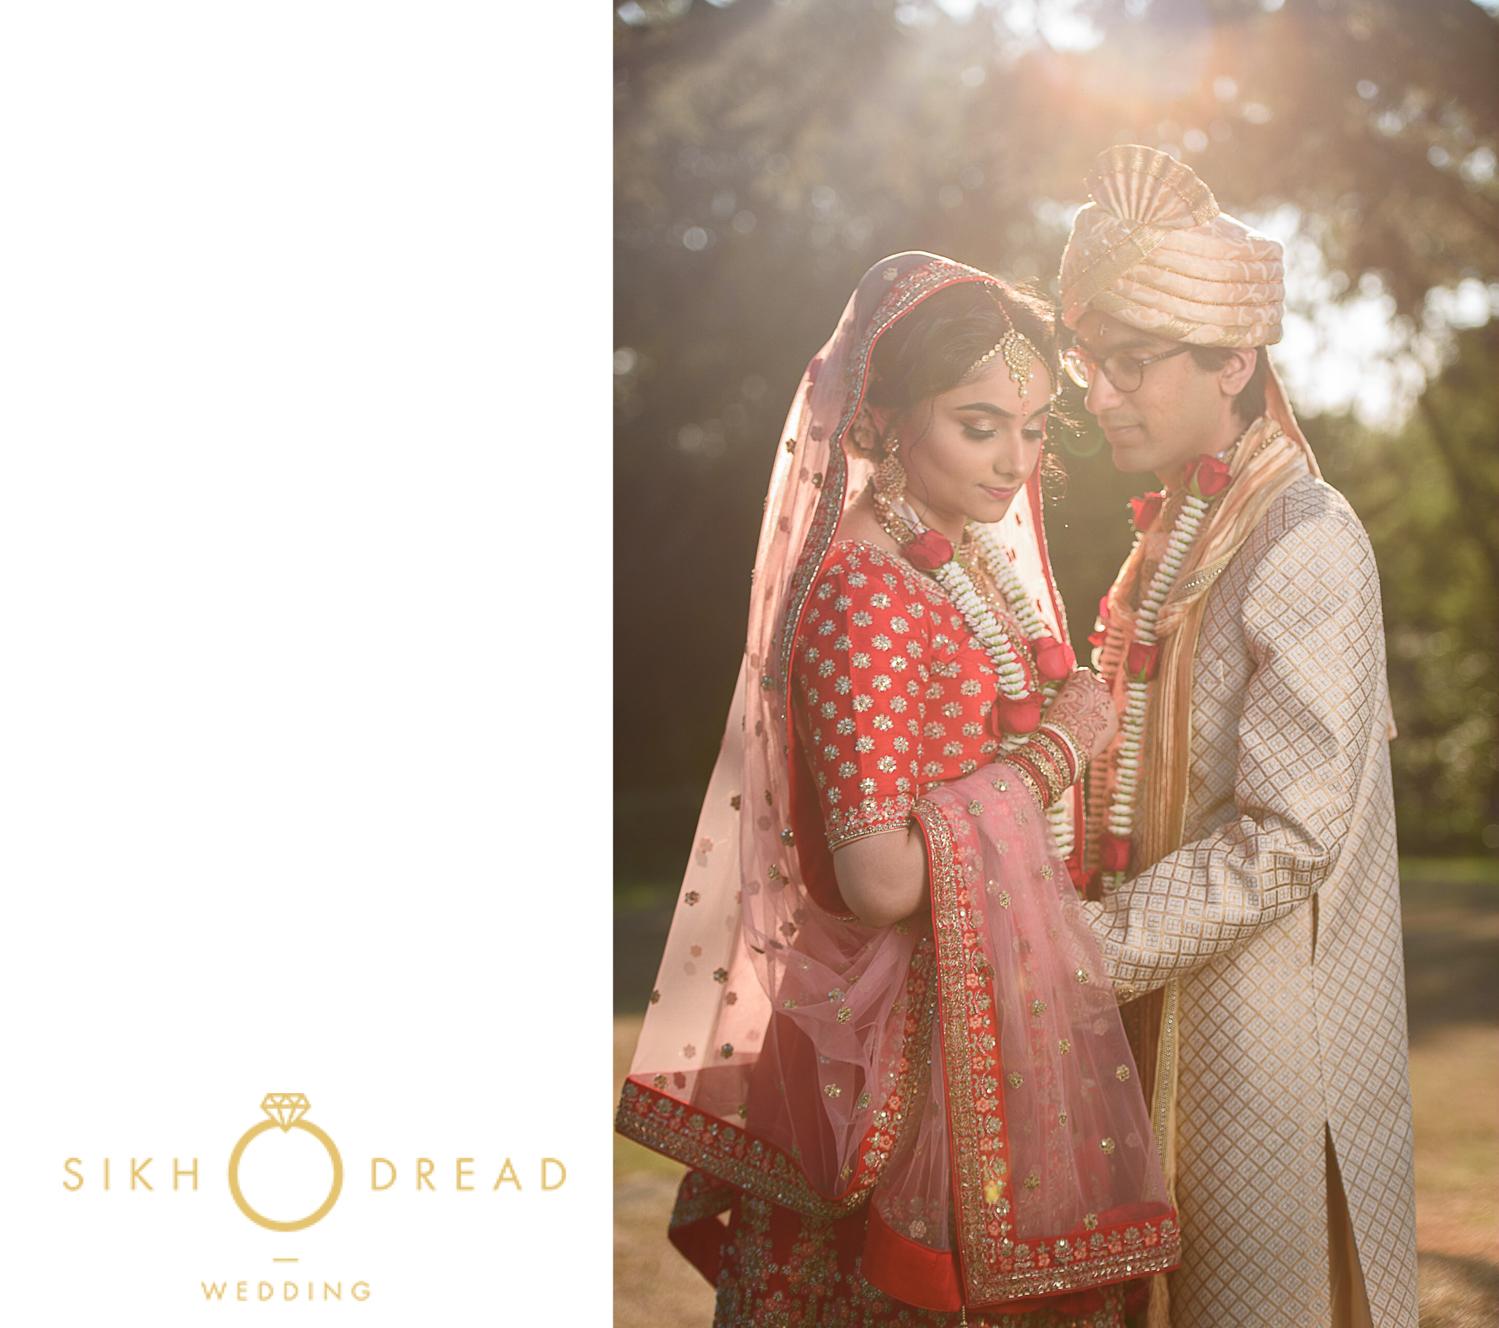 Hedsor House Hindu Wedding34.jpg